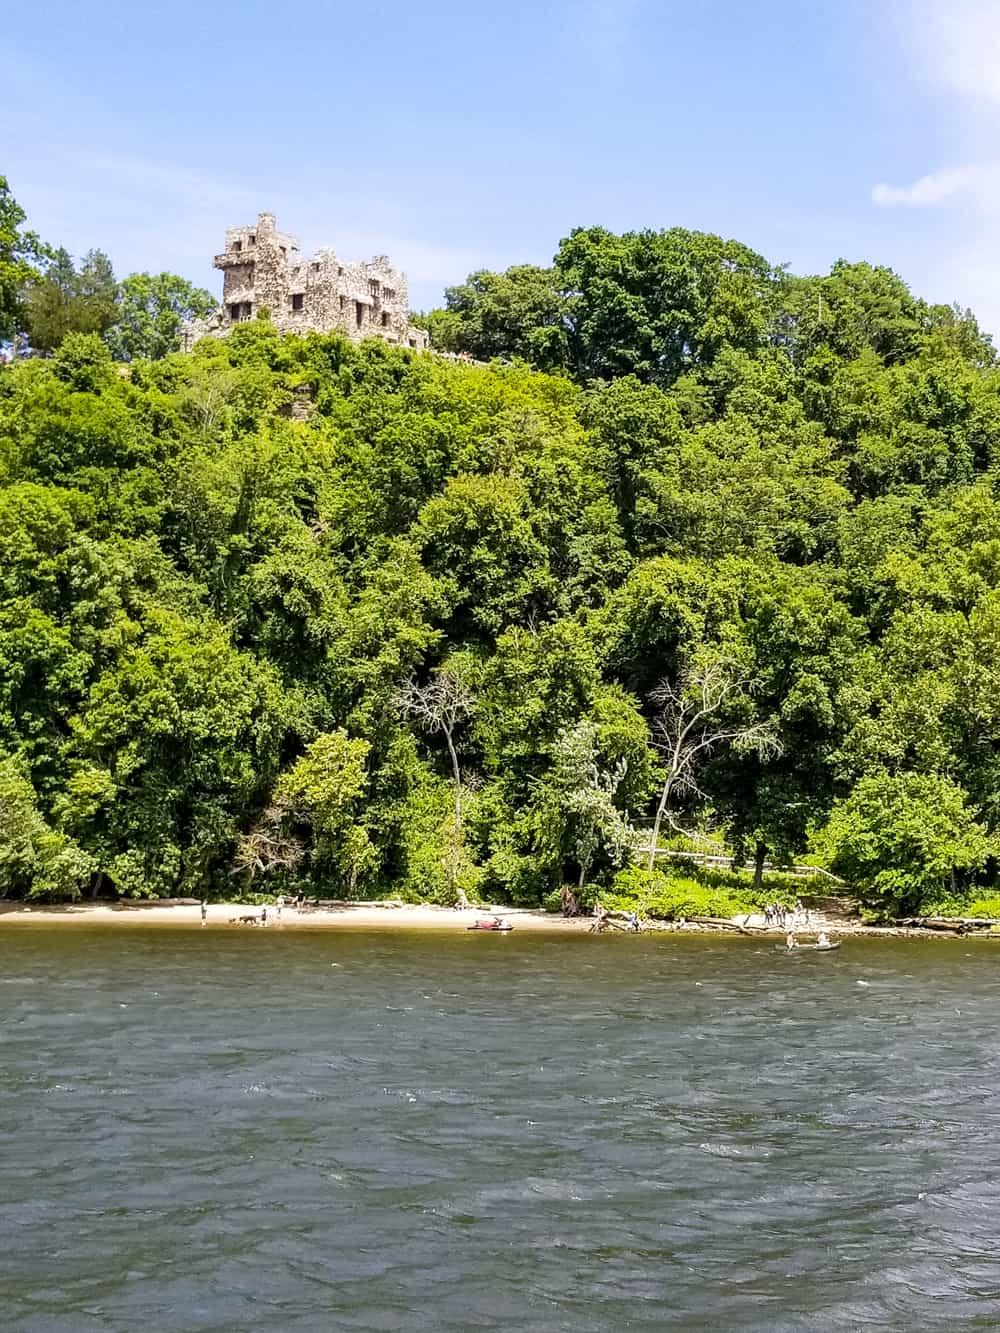 Gillette castle from Connecticut river